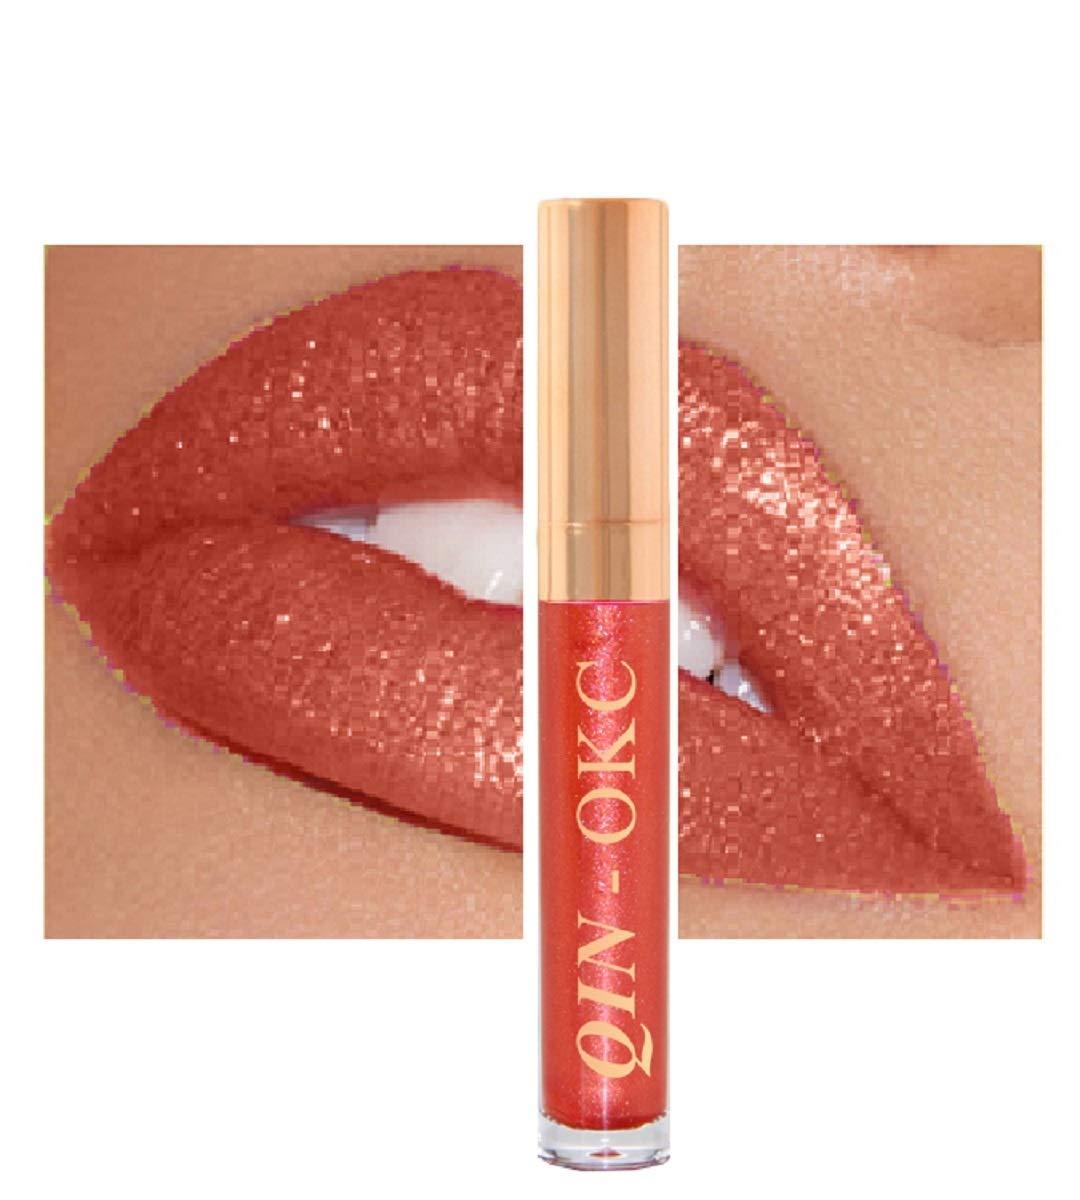 QIN - OKC Shimmer Liquid Lipstick Gloss - Long Lasting - Waterproof - Kiss proof - Super stay - High Shine Lip Stain - Glitter Lip gloss - 0.25 FL oz - (Sunset Gold Red) - Fashion Sense